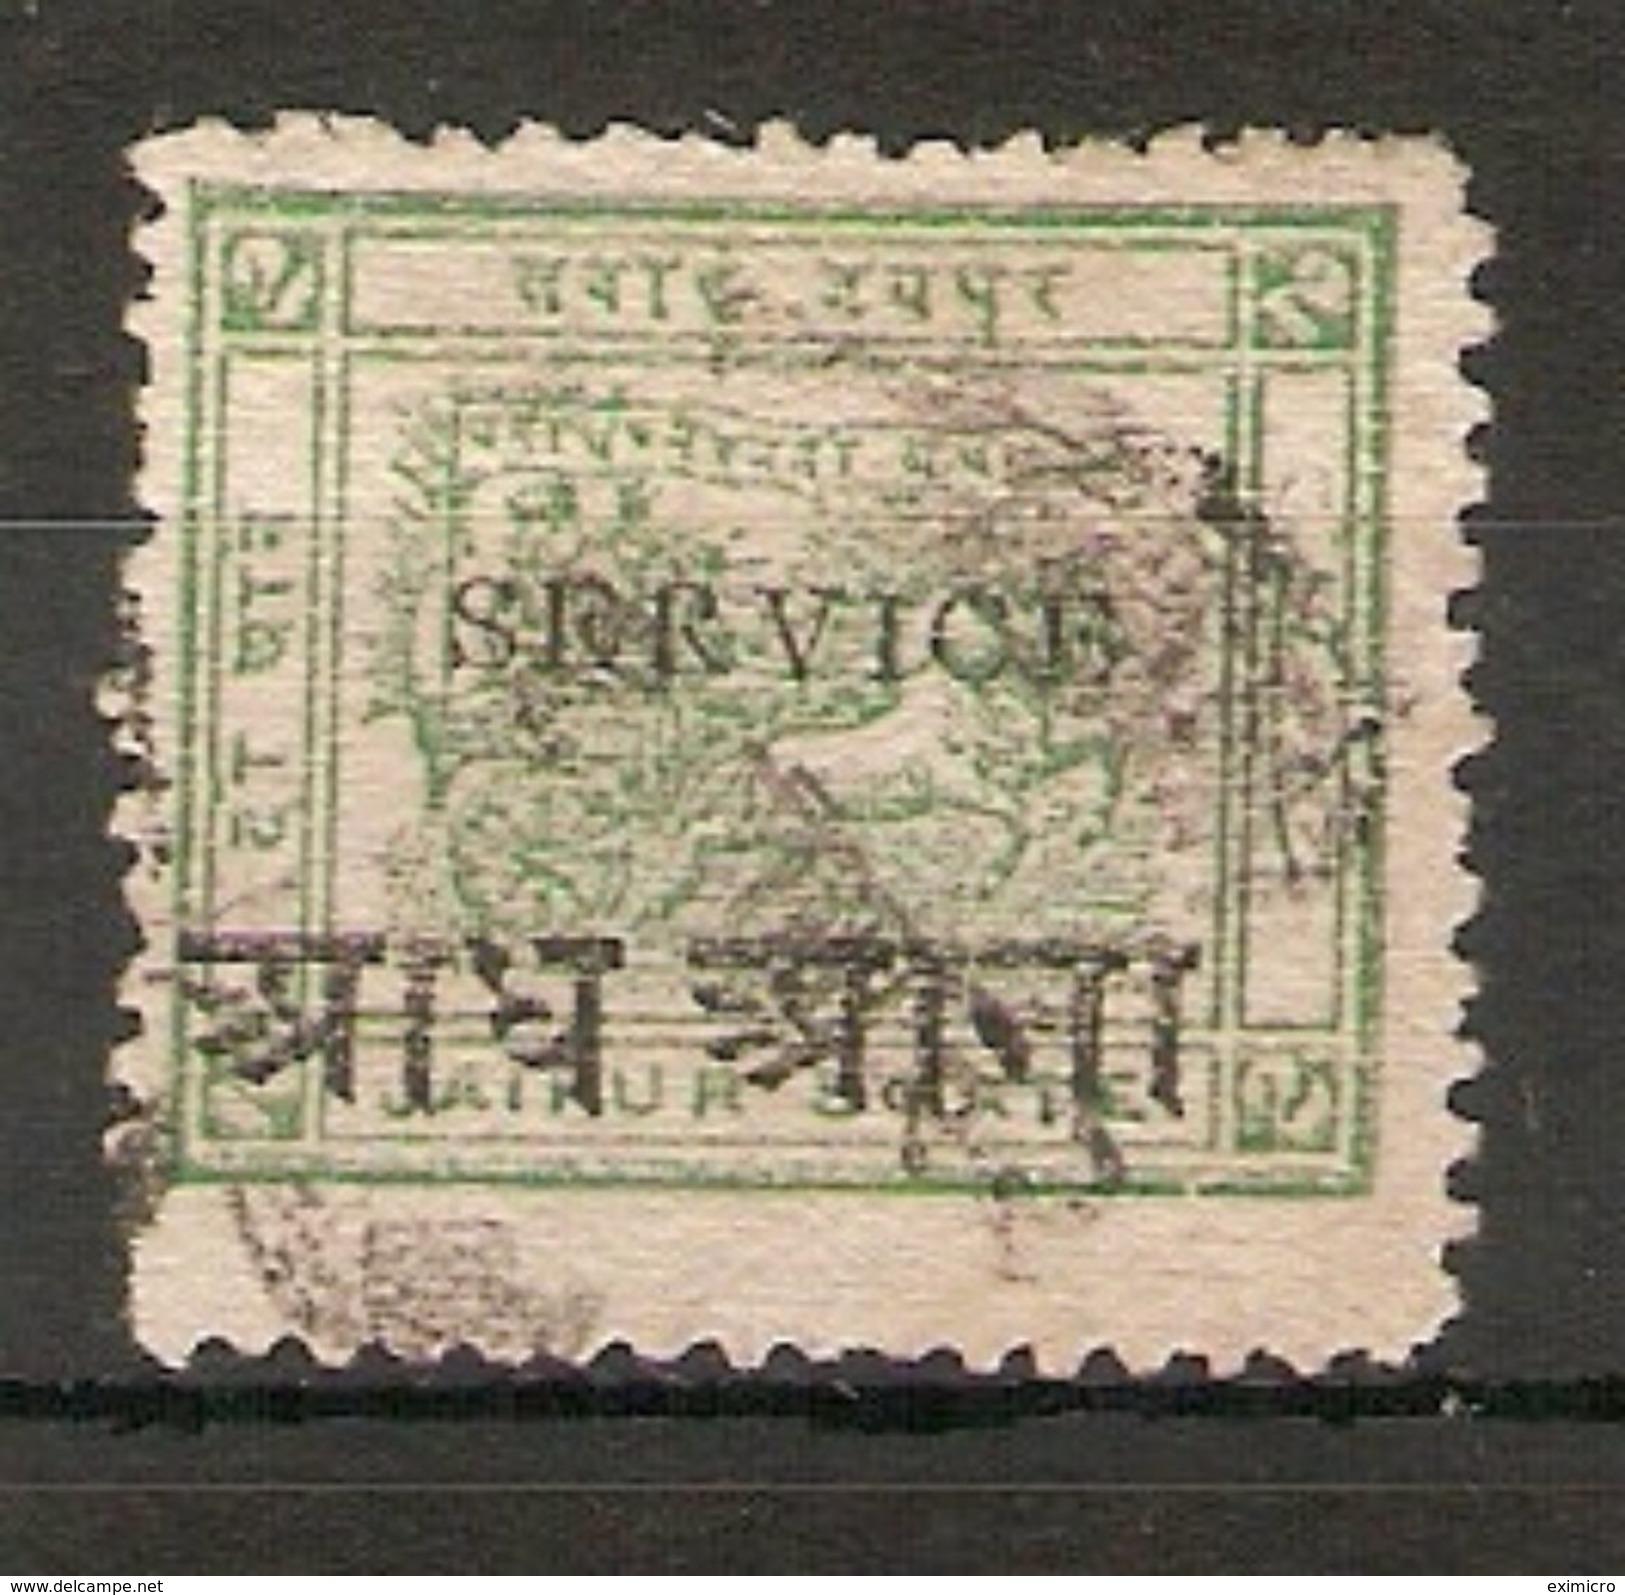 INDIA - JAIPUR 1932 ½a On 2a OFFICIAL SG O17 FINE USED Cat £6 - Jaipur